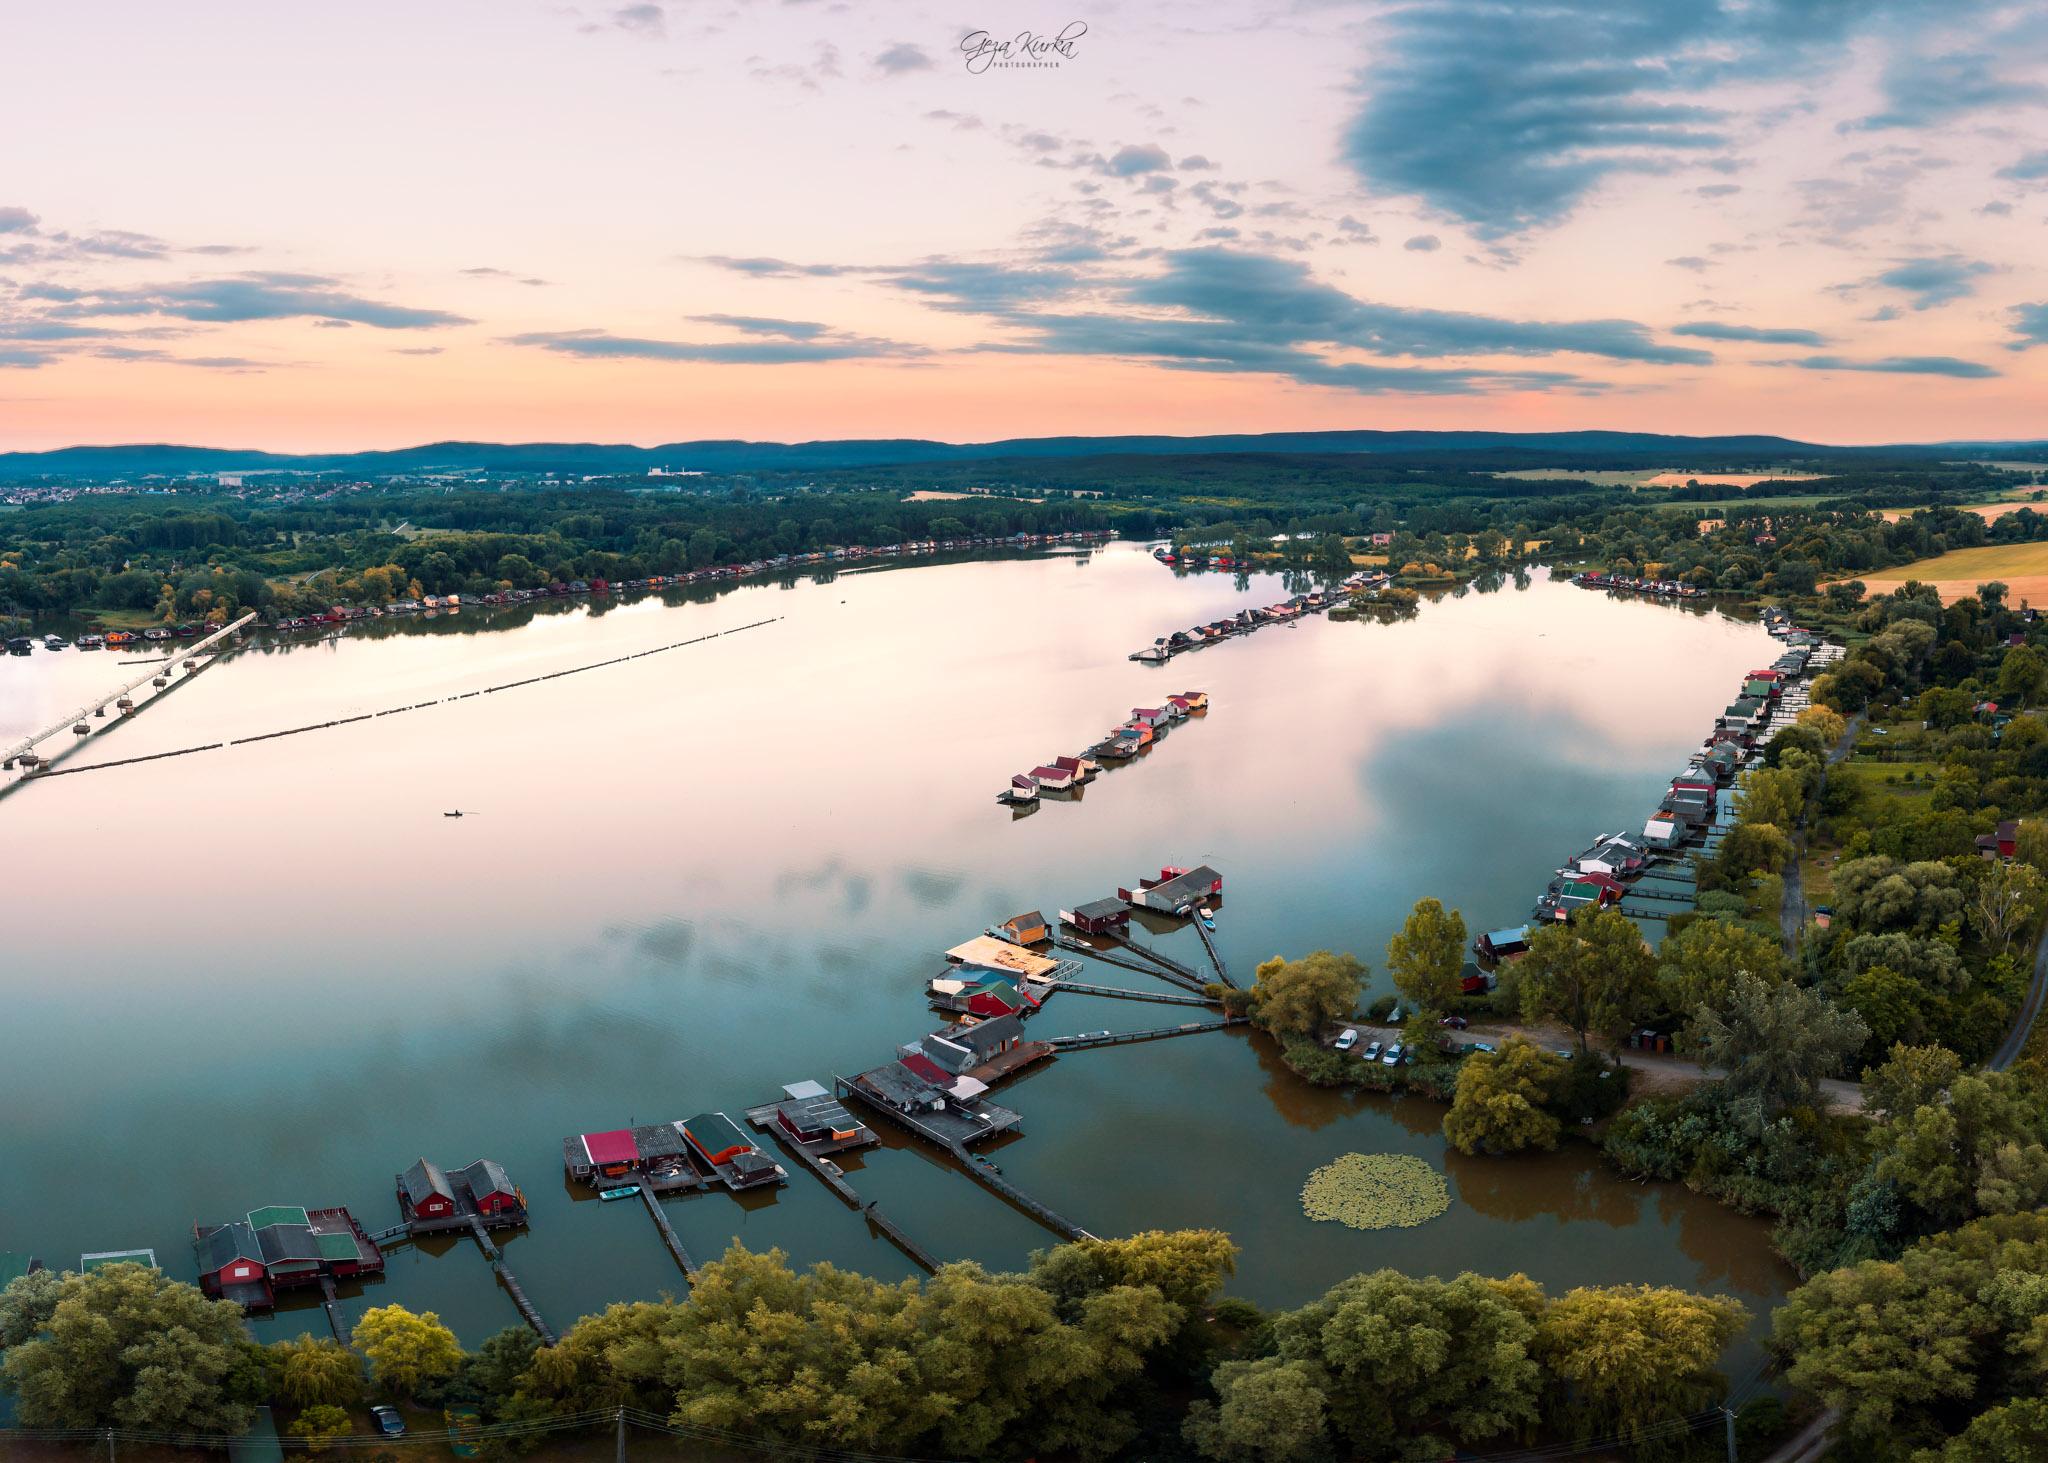 lake Bokod aerial landscape, Hungary